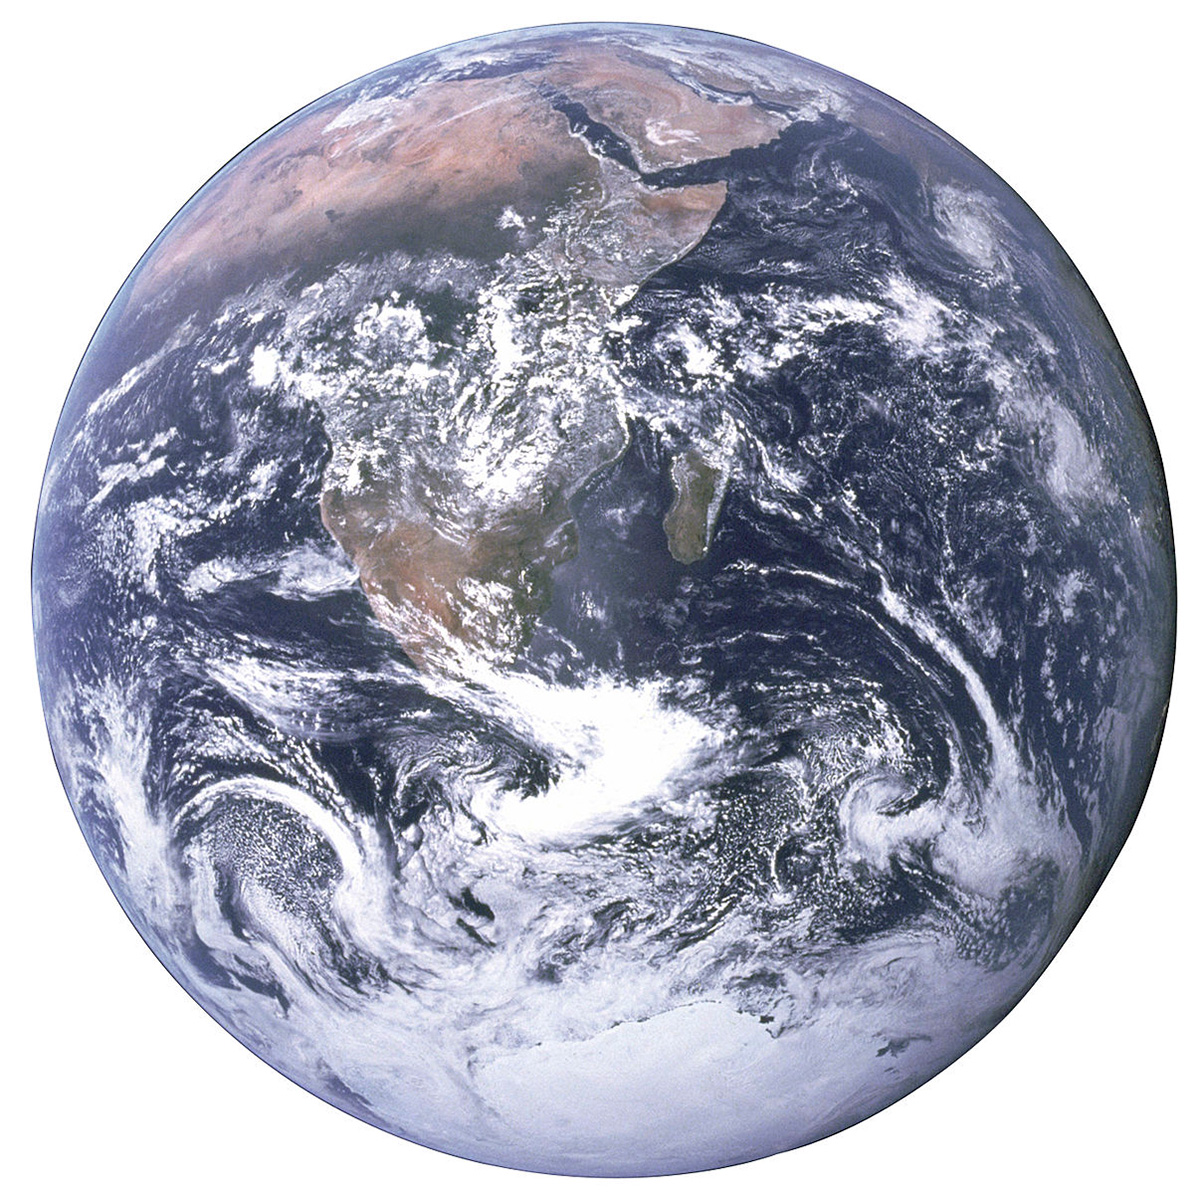 EarthSpaceApollo17.jpg